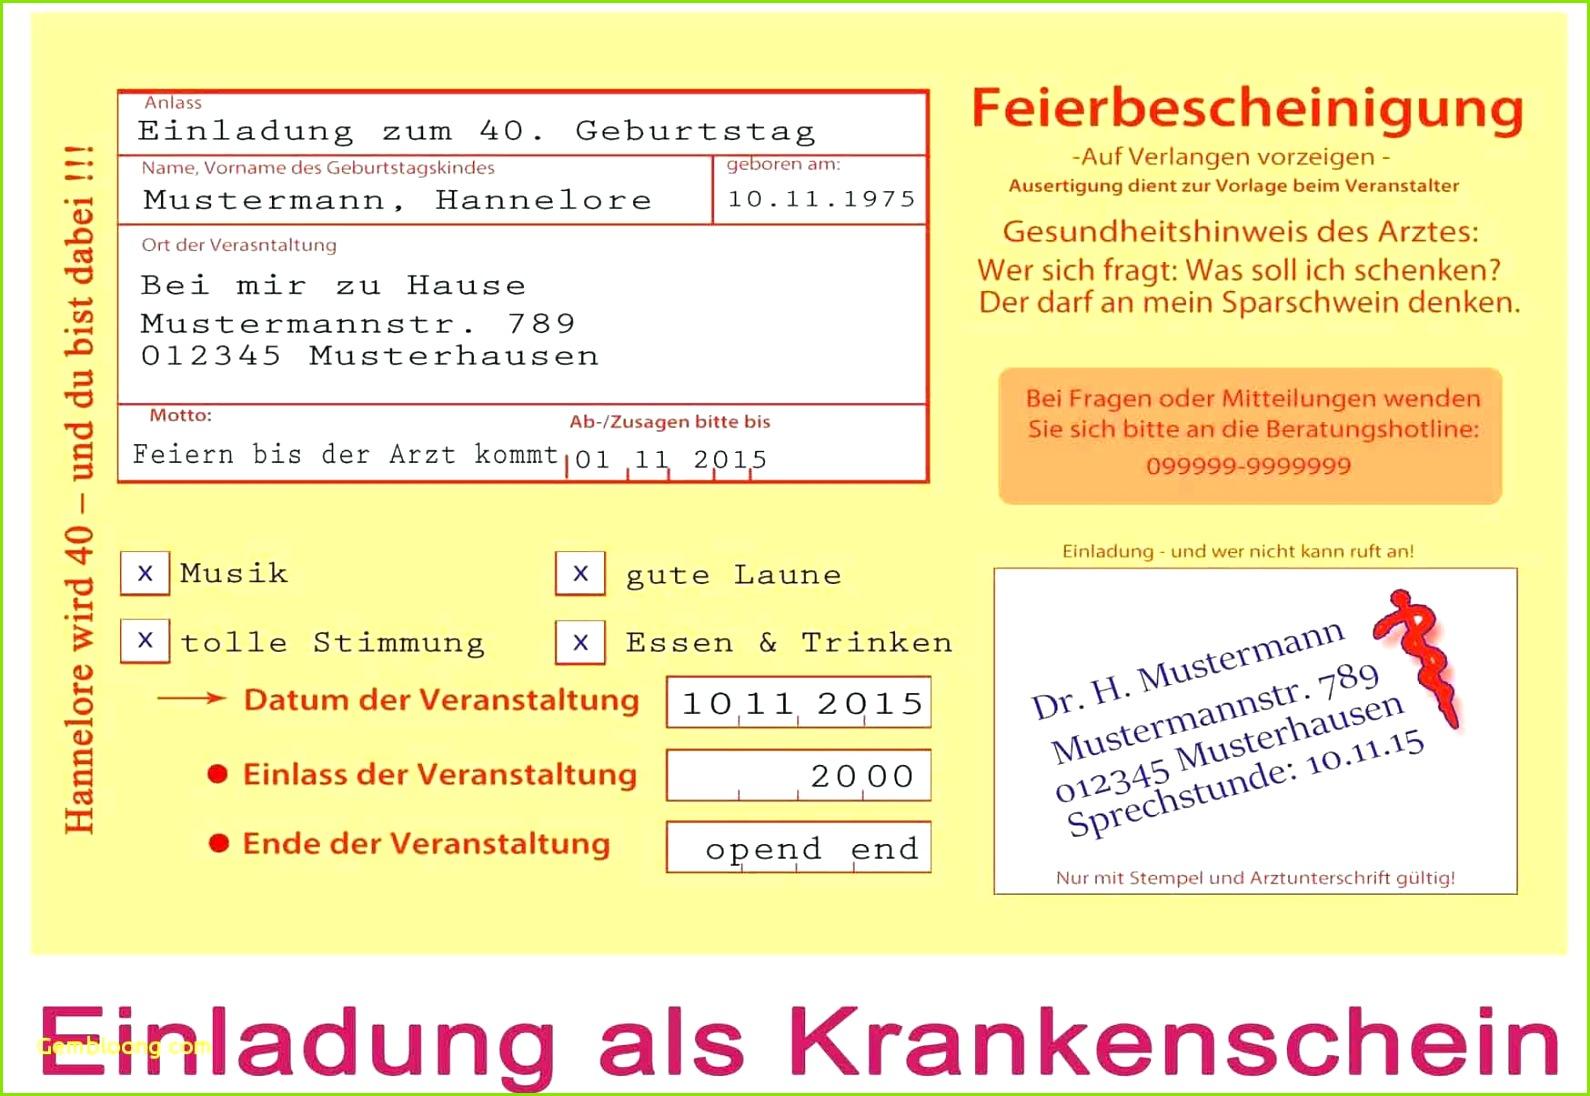 Einladung 50 Geburtstag Einladung 60 Geburtstag Vorlagen Kostenlos Einladungskarten Vorlagen Einladung 50 Geburtstag